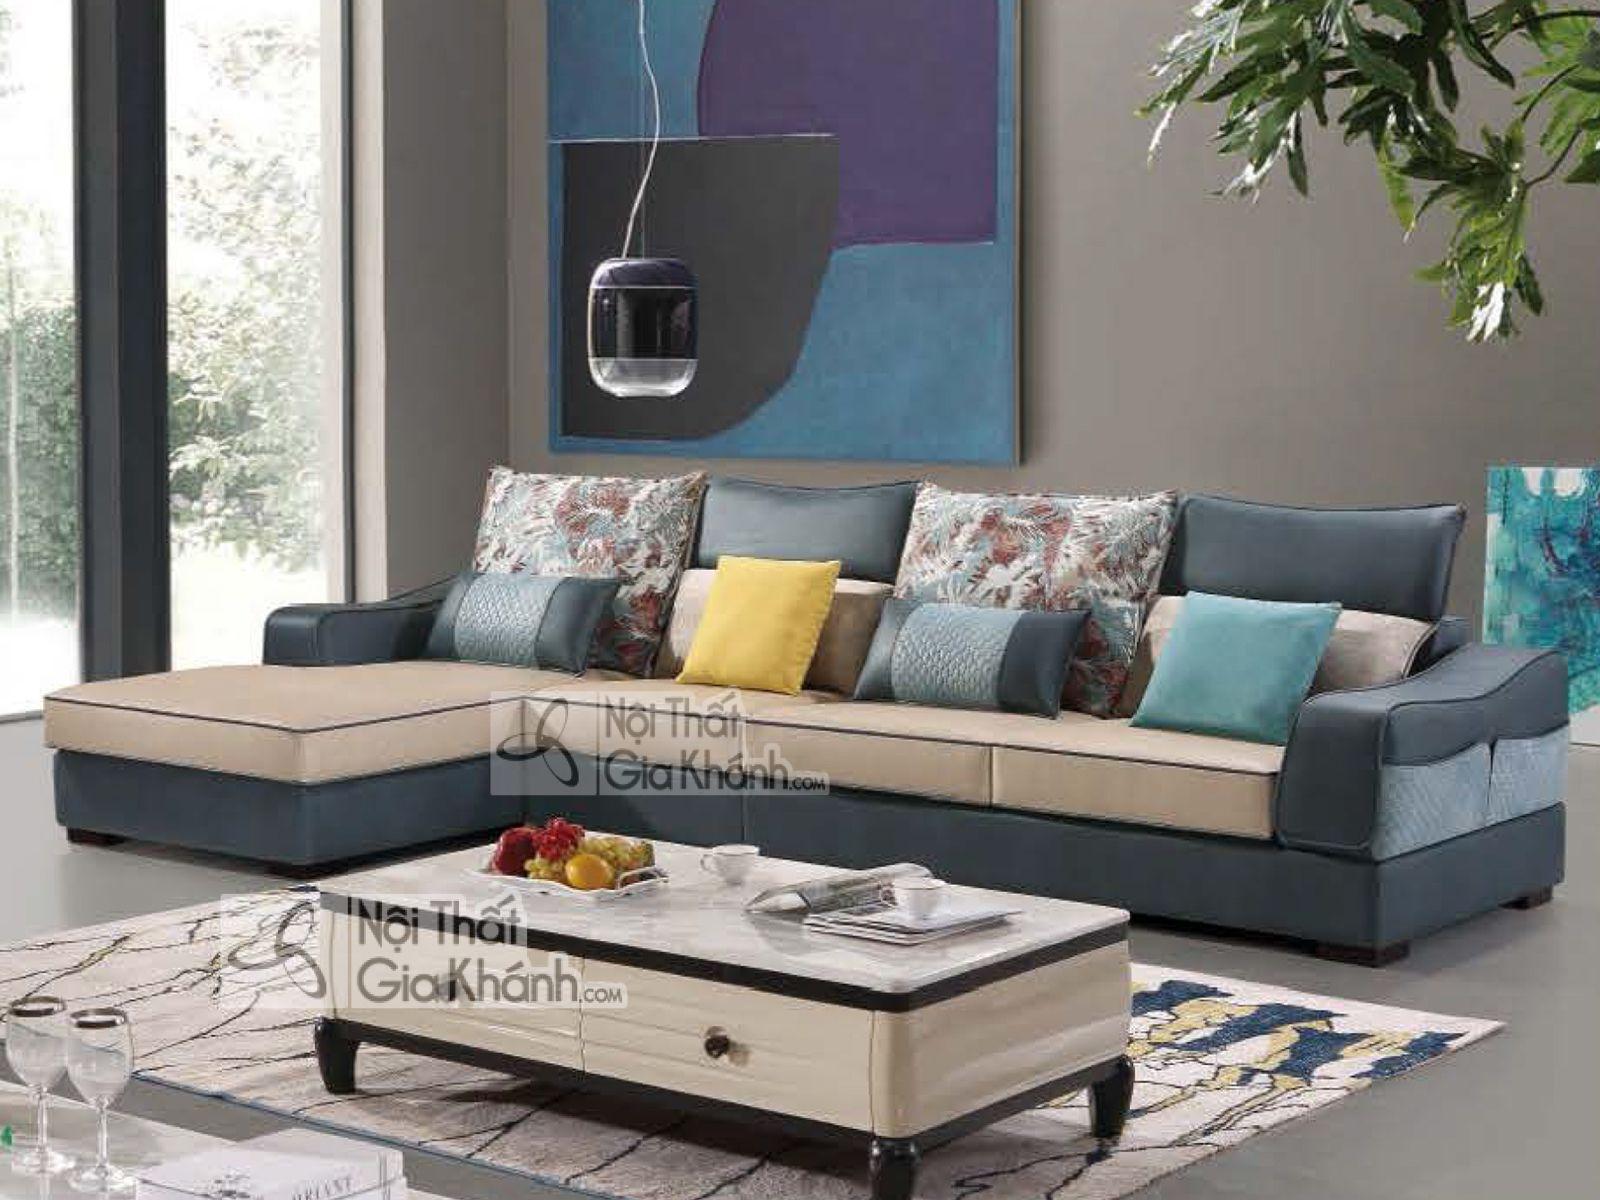 Mẫu ghế Sofa vải nỉ tân cổ điển